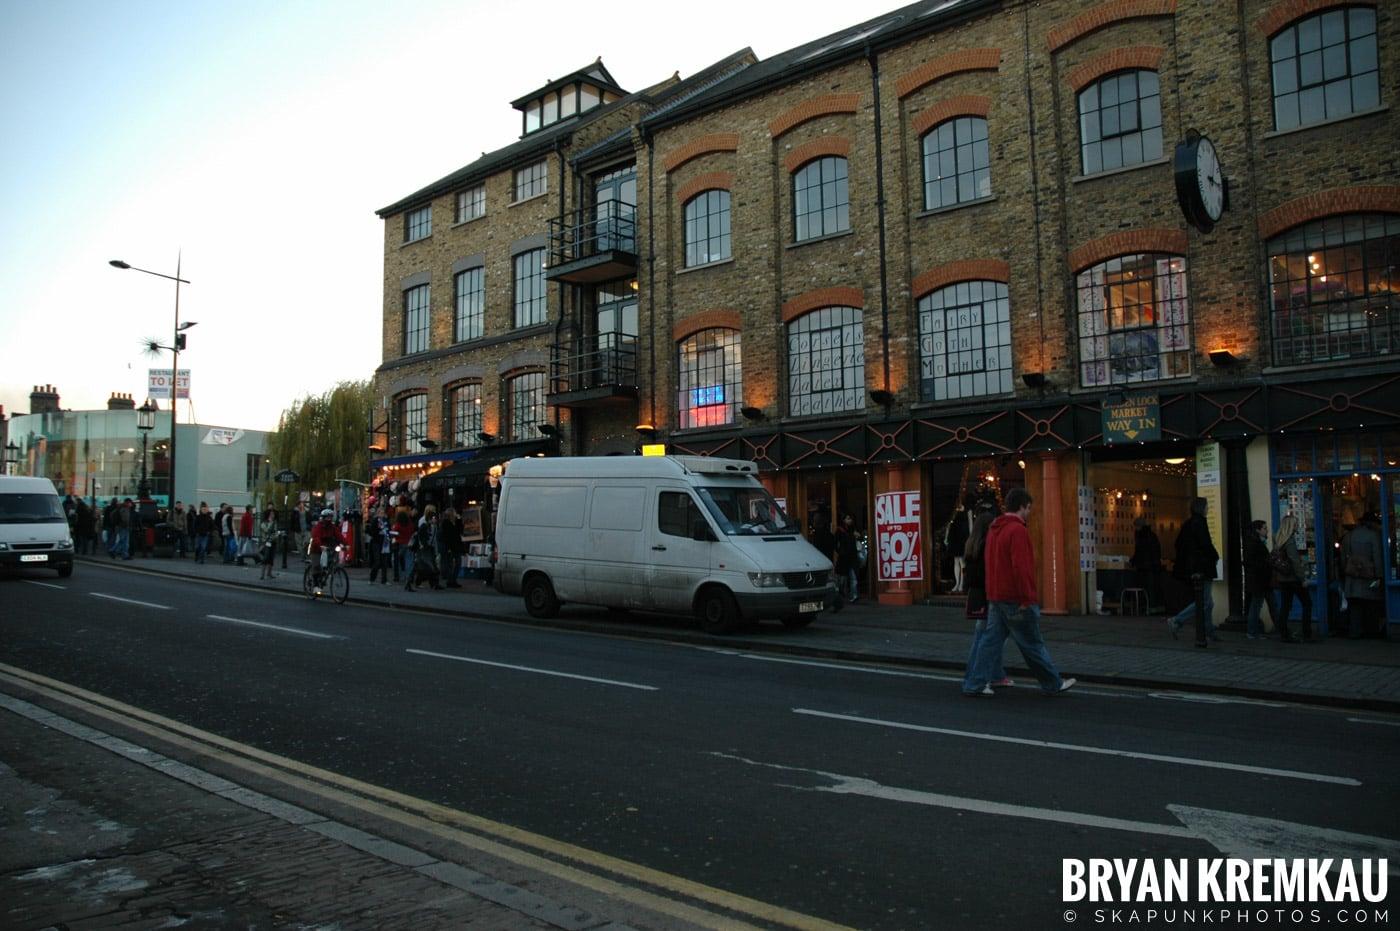 London, England - Day 4 - 12.19.05 (8)